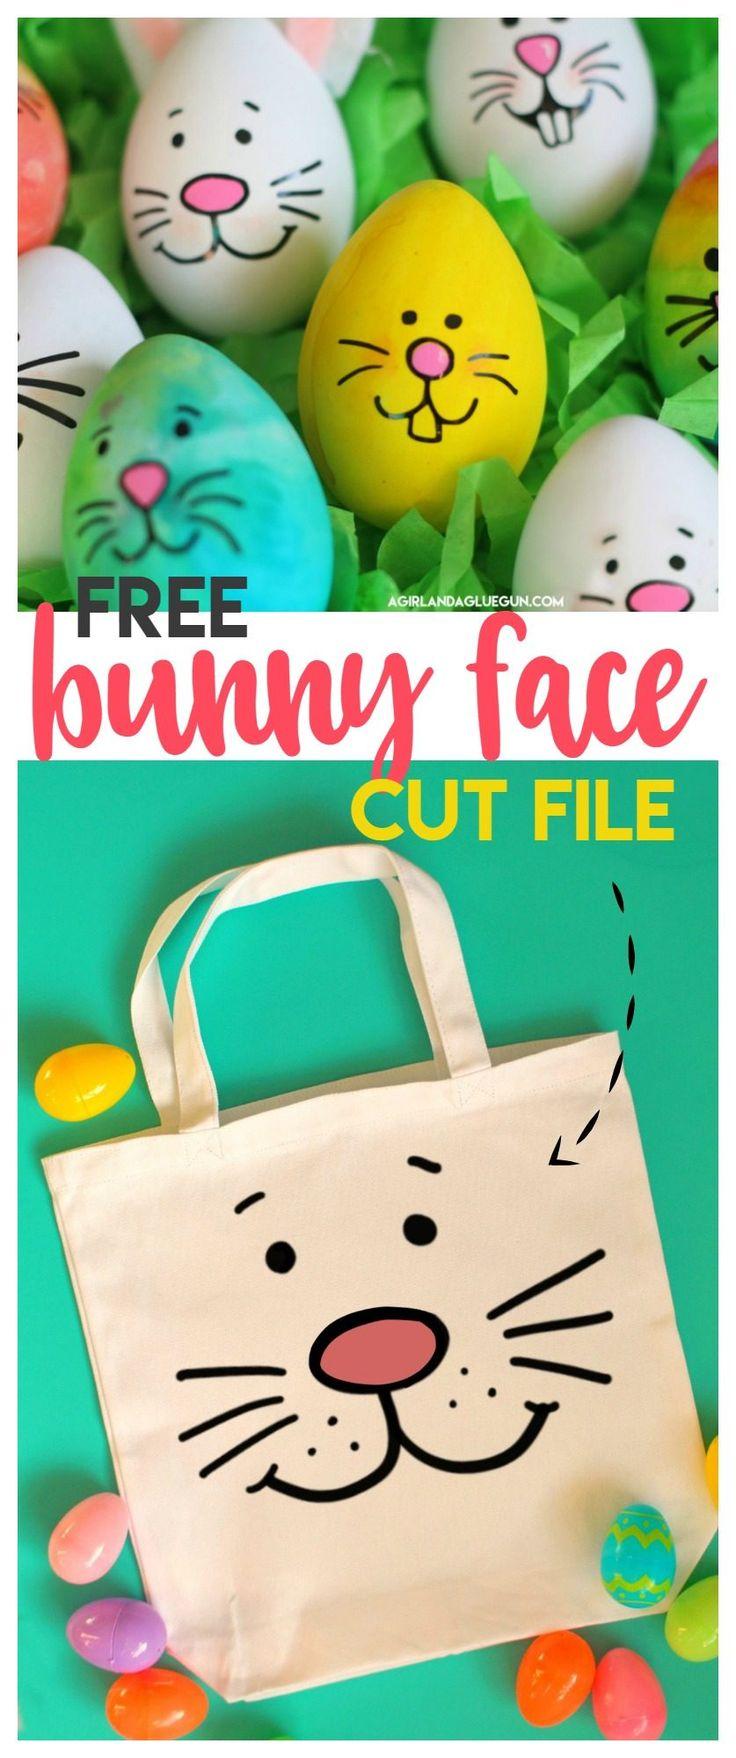 free bunny face cut file